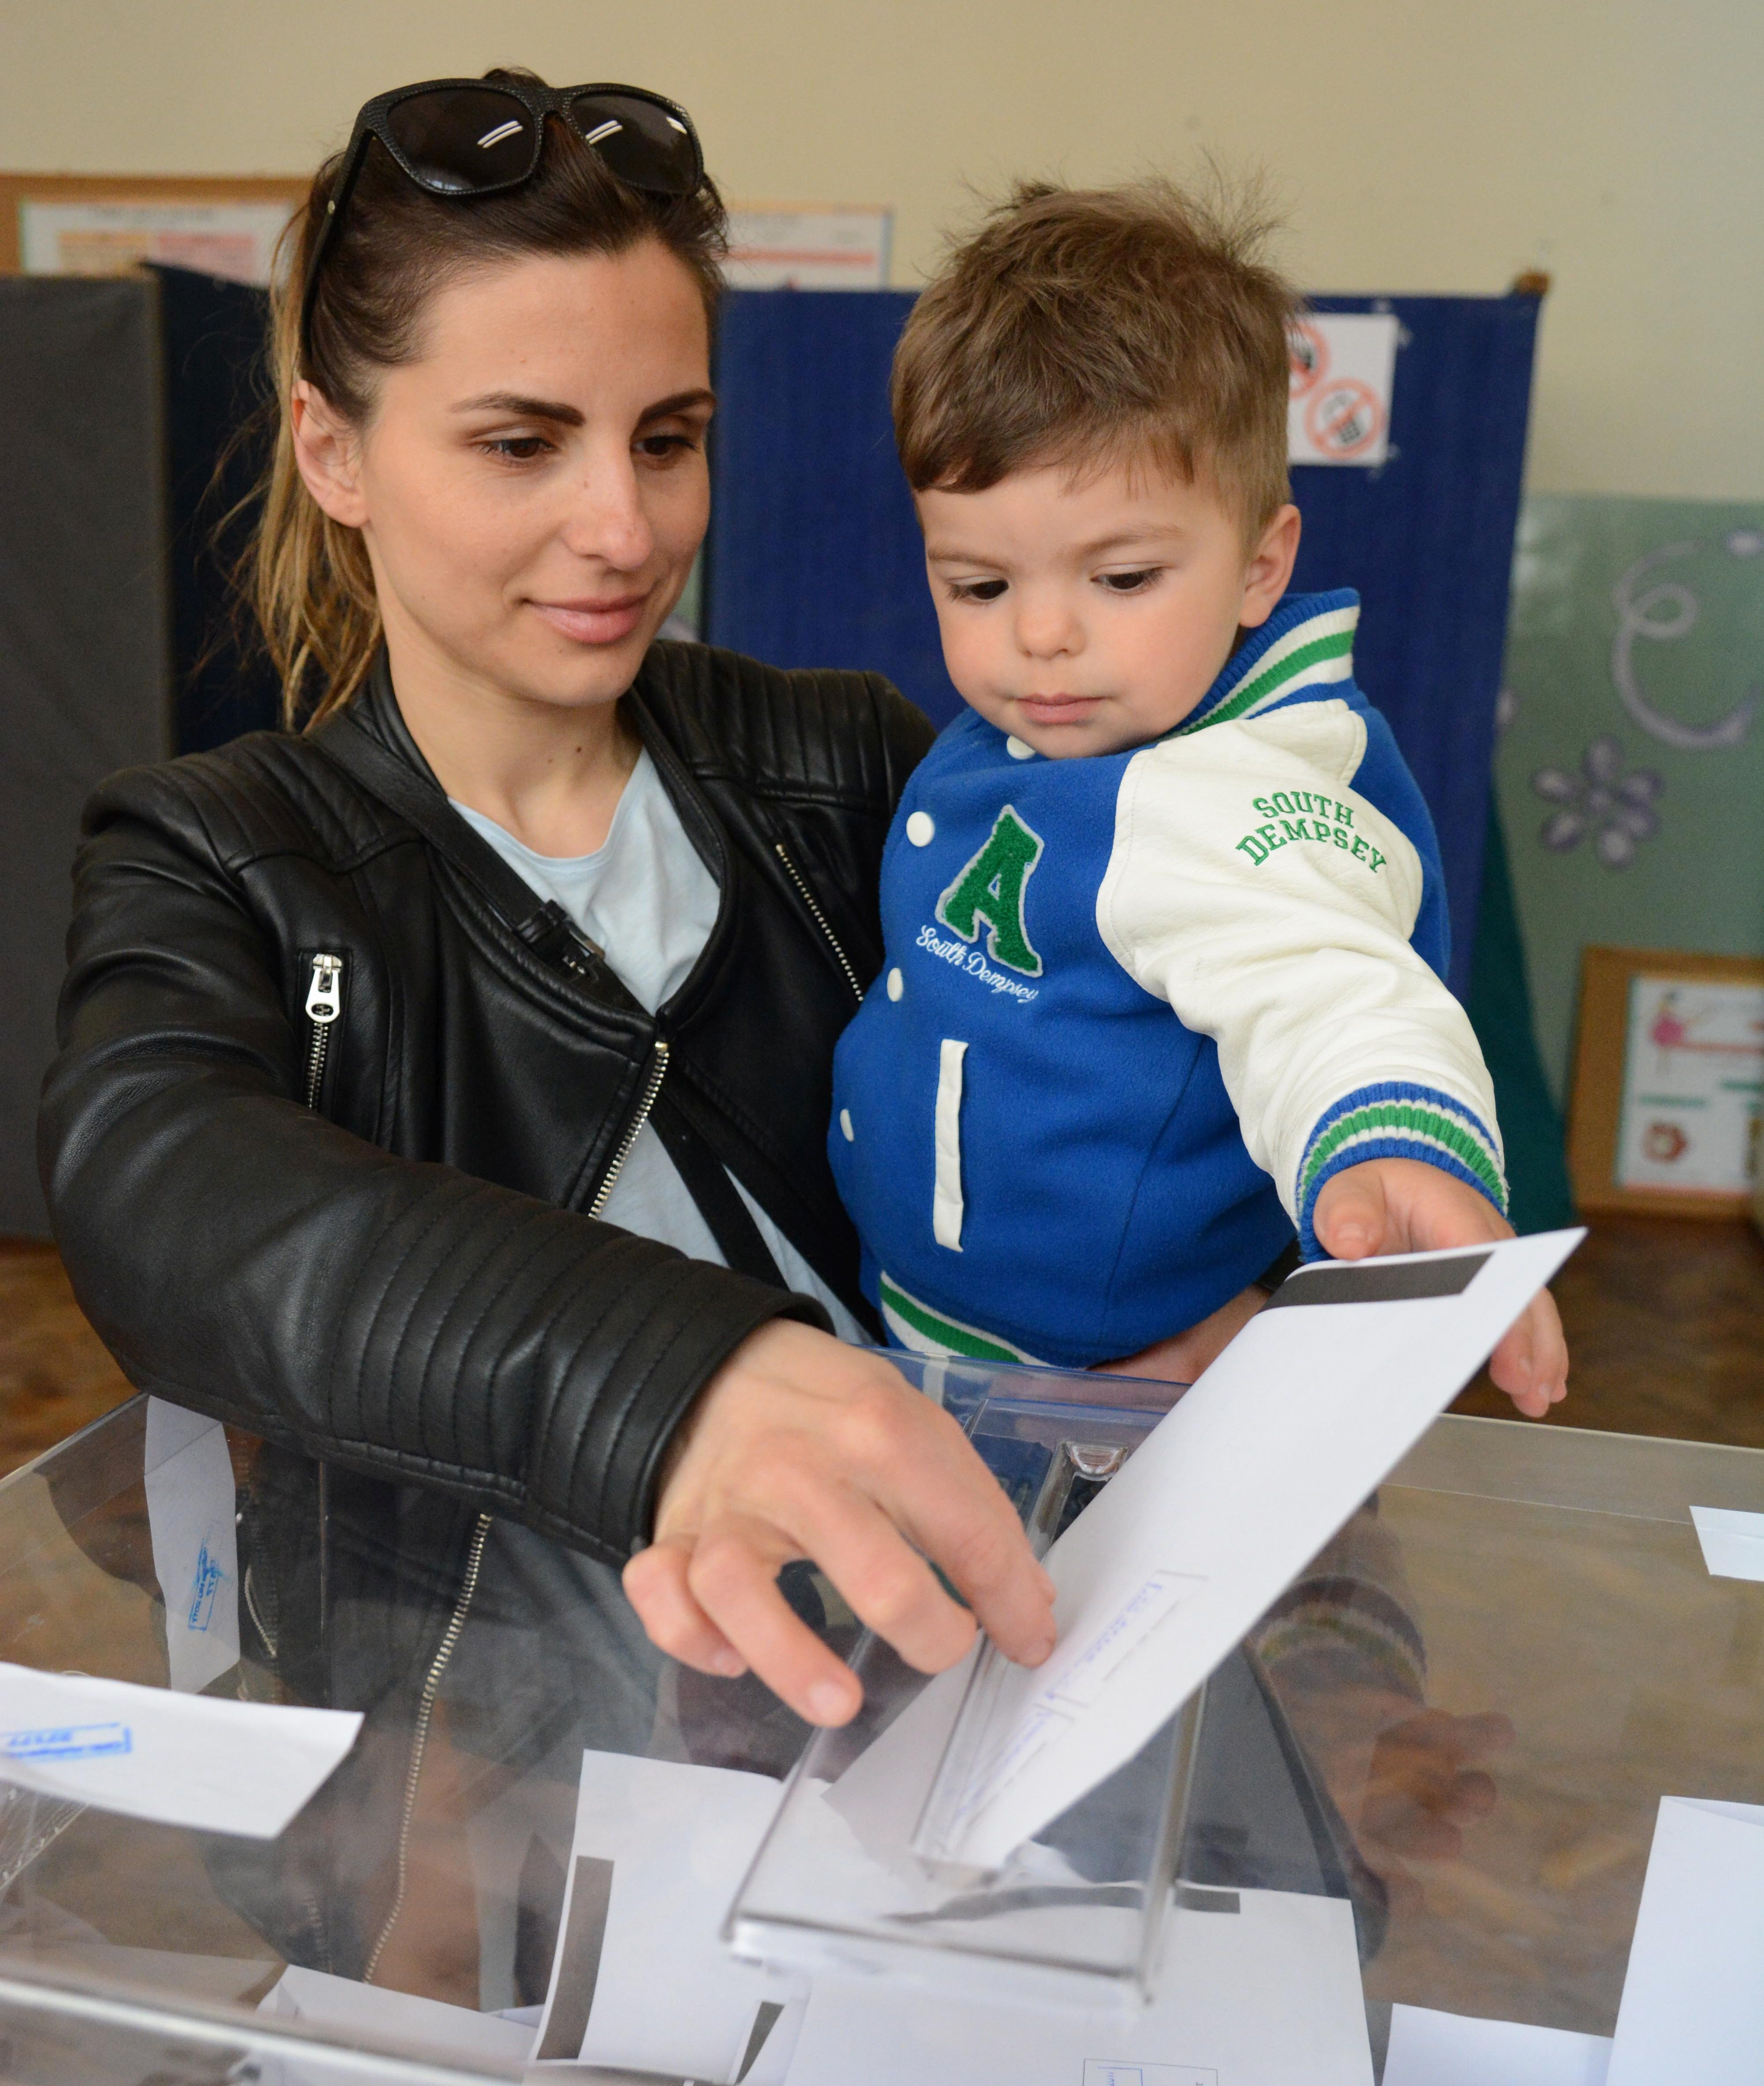 ПАСЕ оцени изборите като свободни и добре организирани